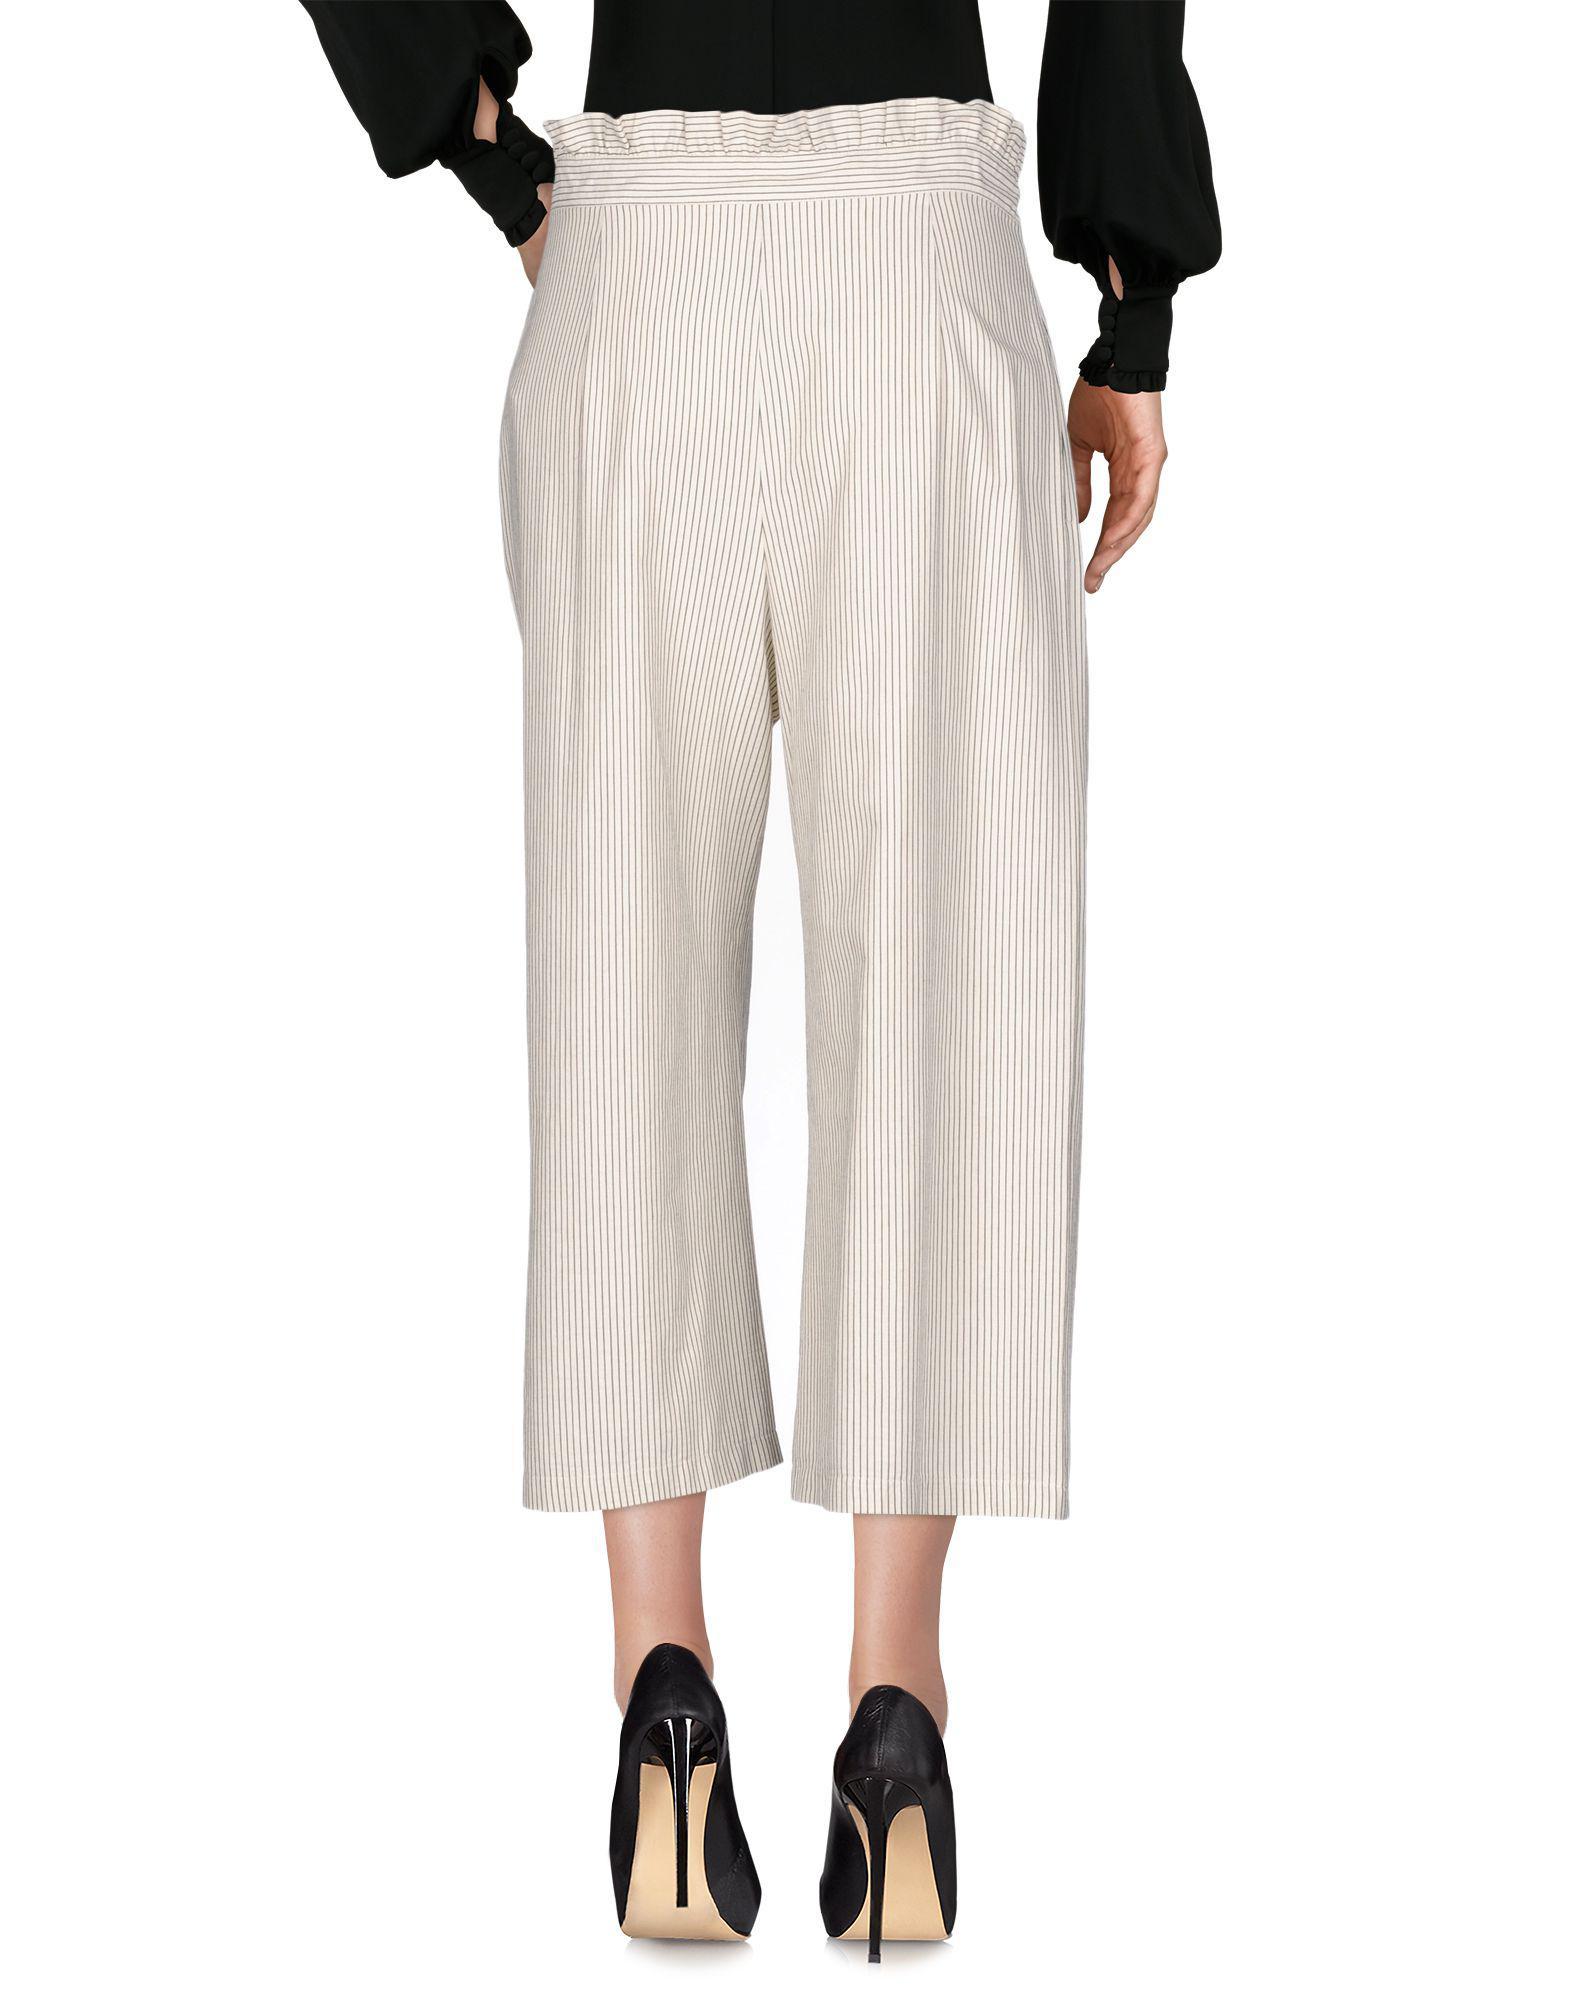 c76c1bd4180459 topshop-Ivory-34-length-Trousers.jpeg